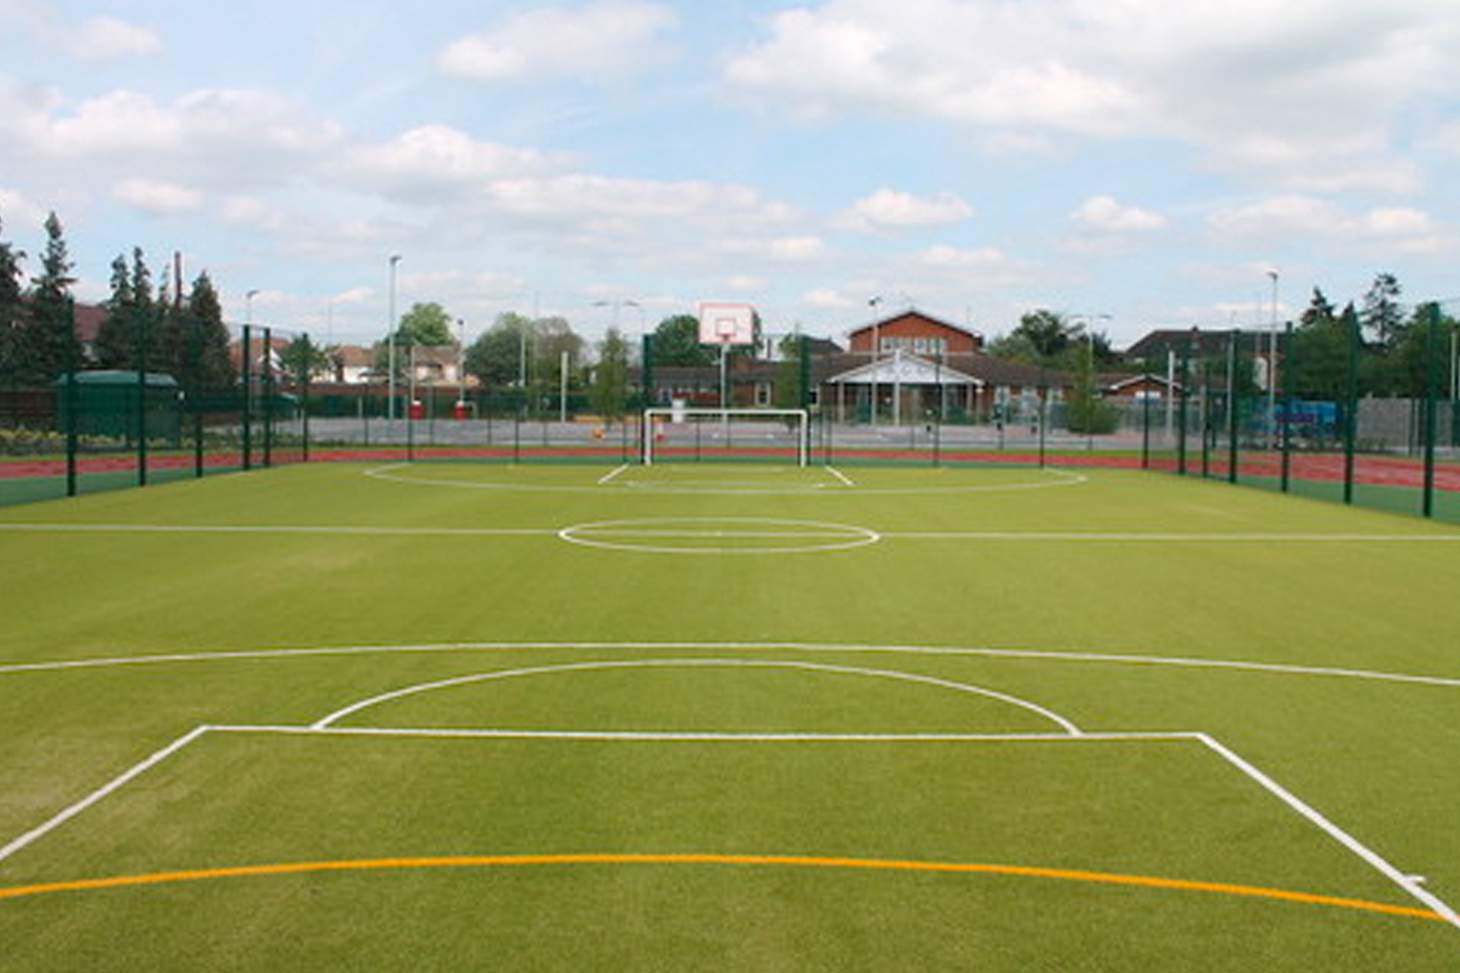 Oaklands School 6-a-side pitch | Sand-based Astroturf hockey pitch